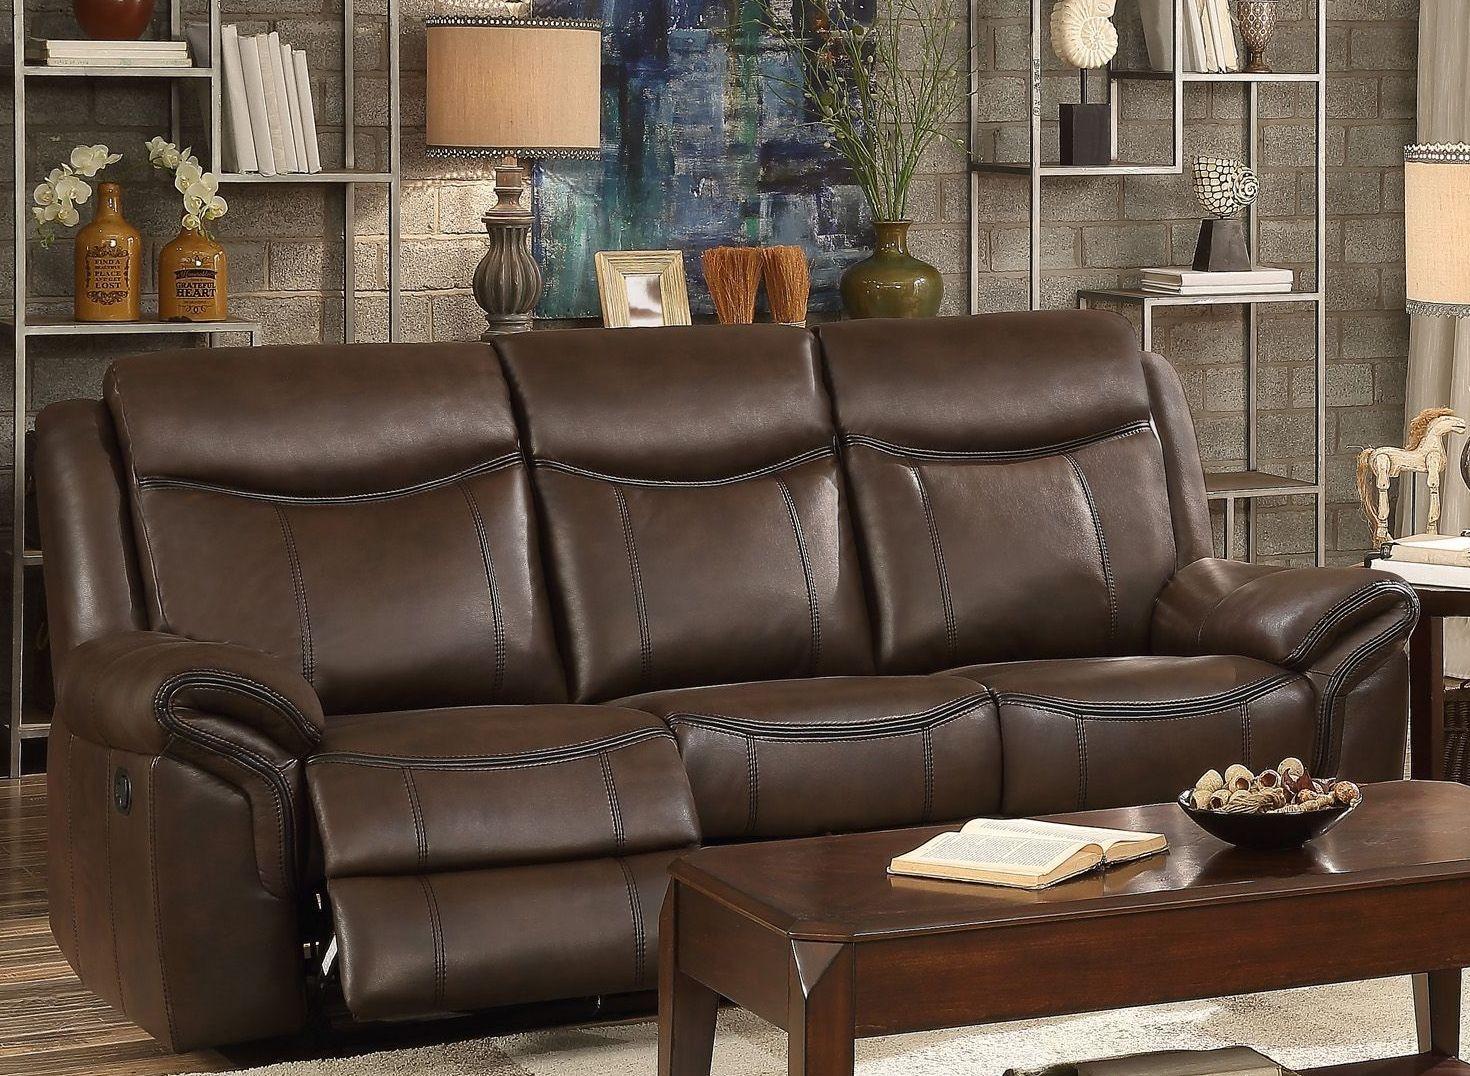 Aram Dark Brown Double Reclining Sofa From Homelegance